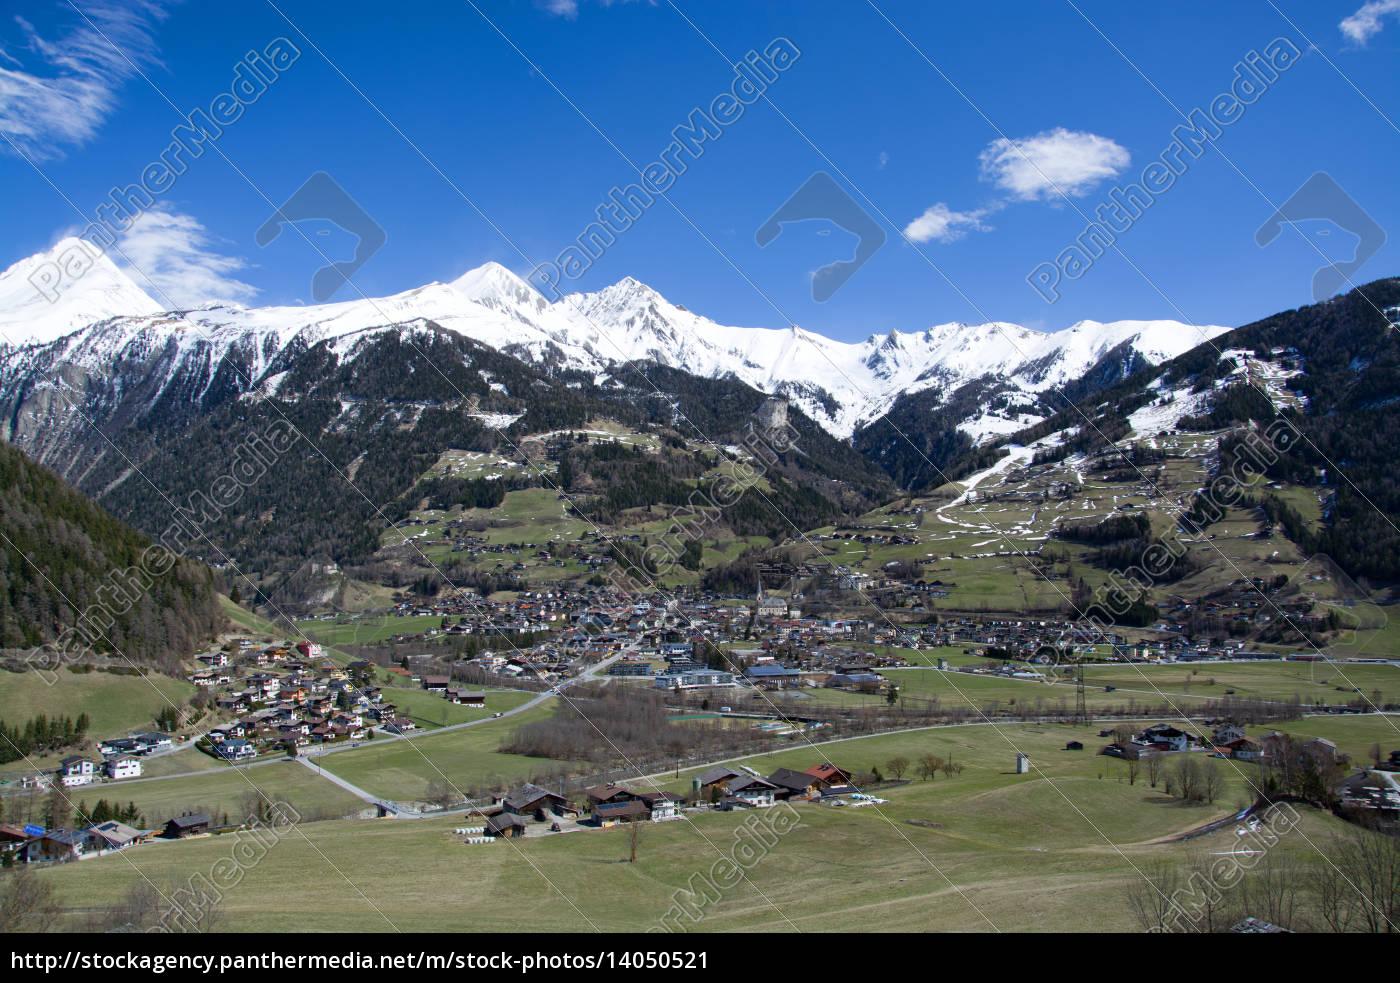 martei, east, tyrol, austria - 14050521